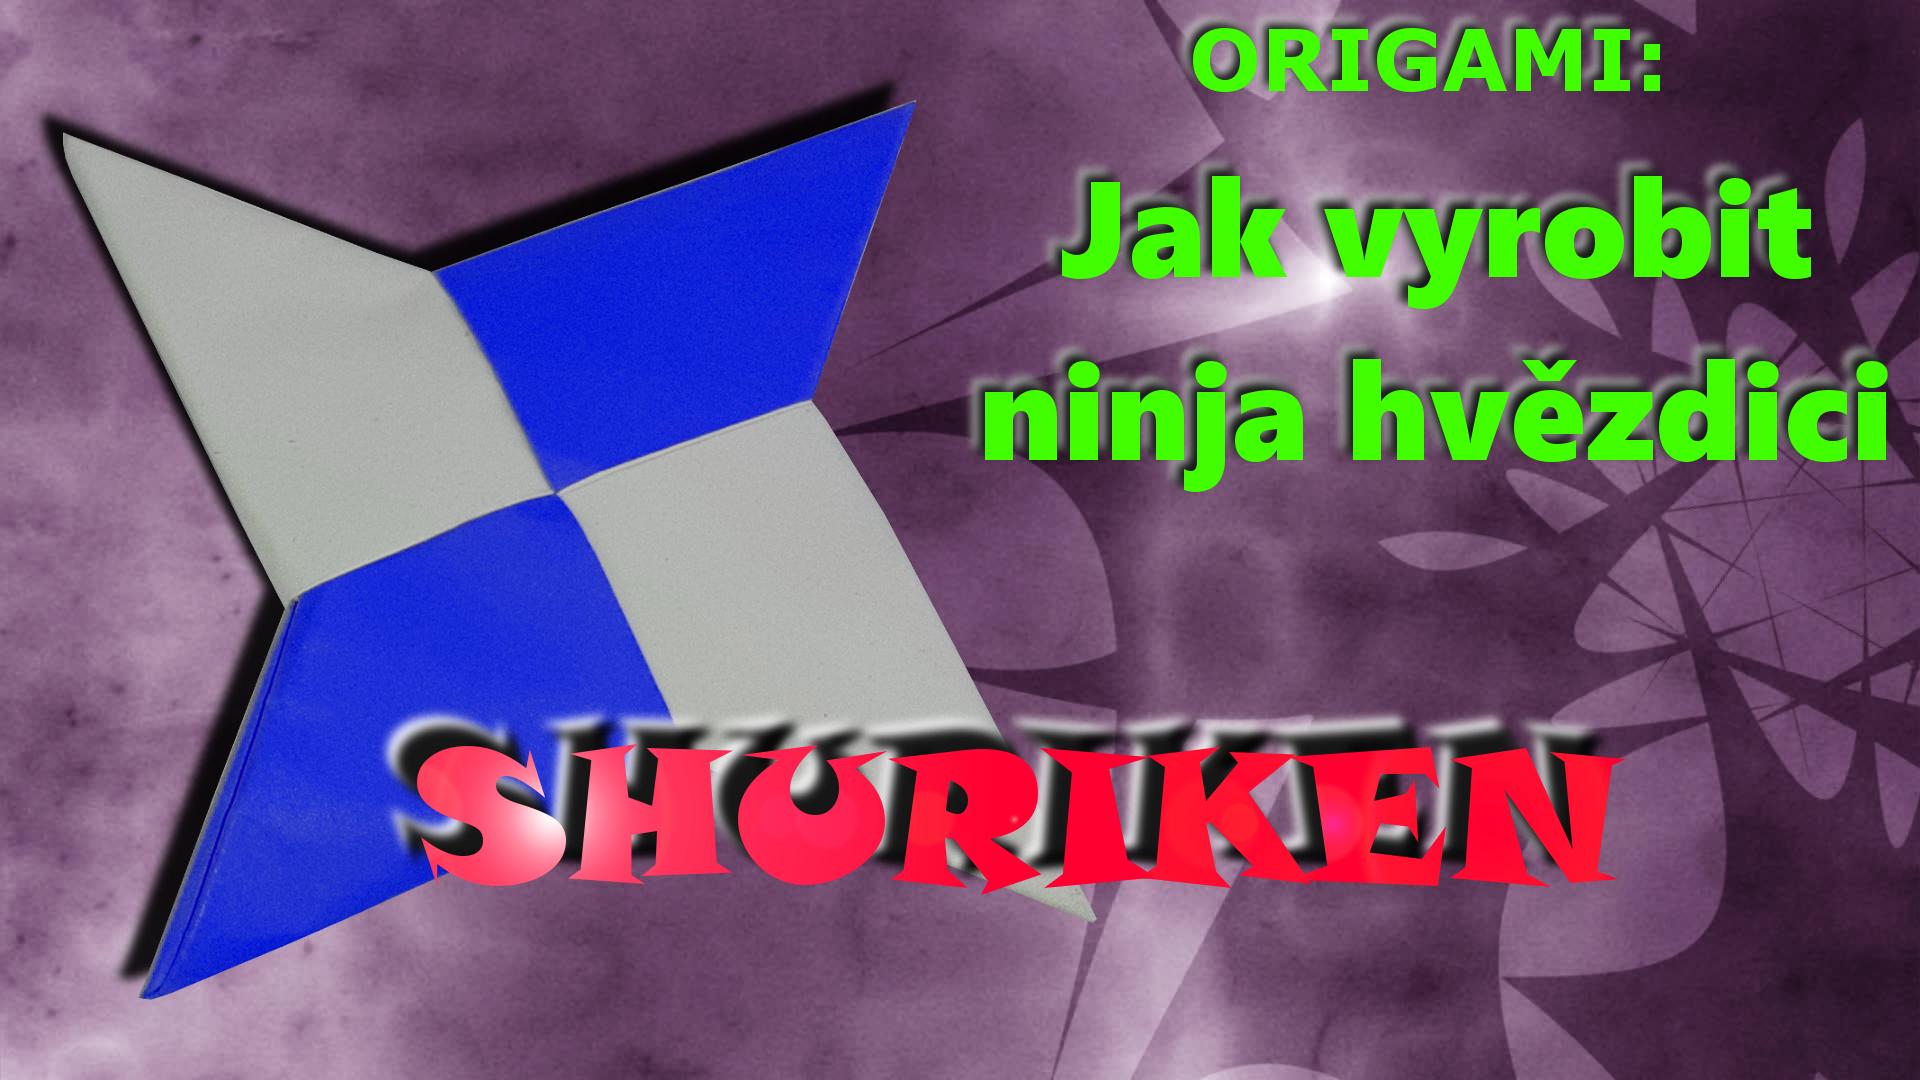 Shuriken - jak vyrobit origami ninja hvězdici